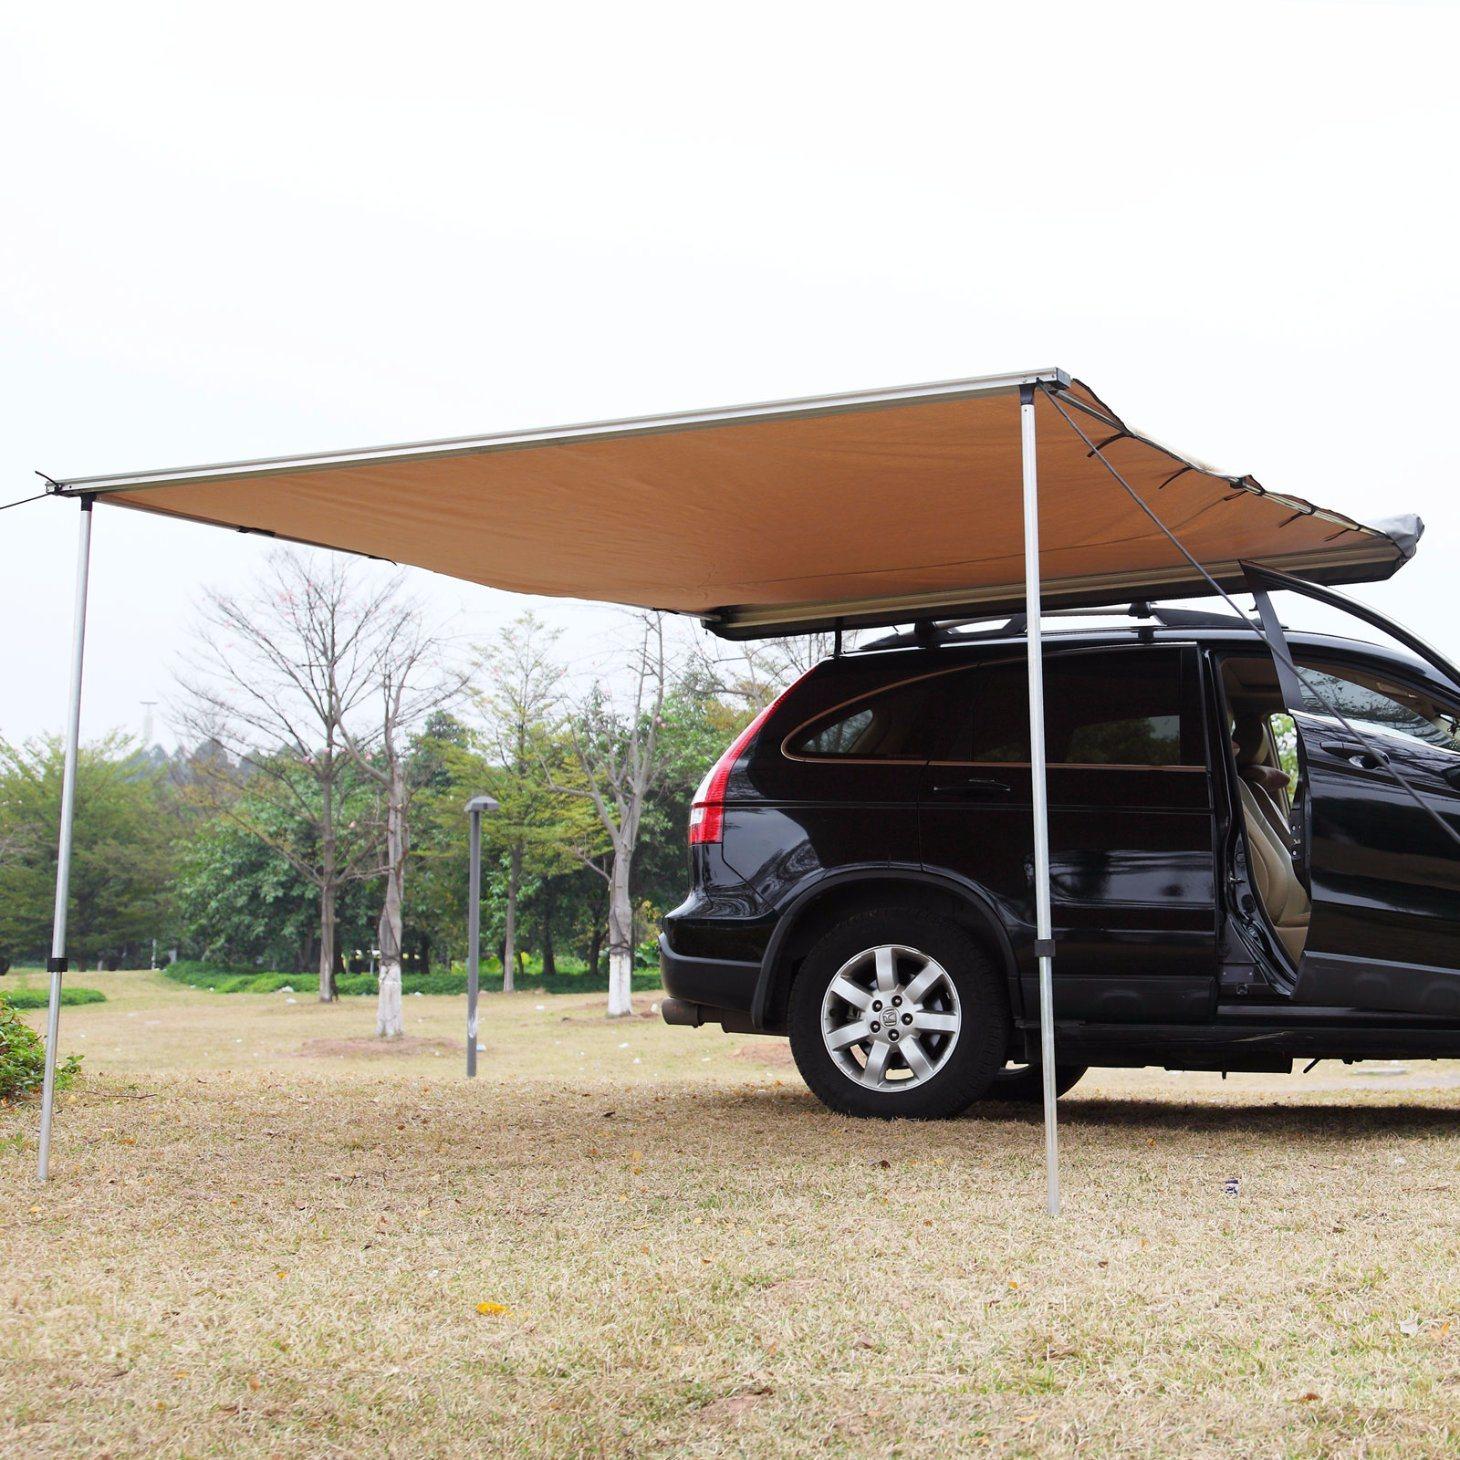 High Quality Folding Car Side Awning for Traveler